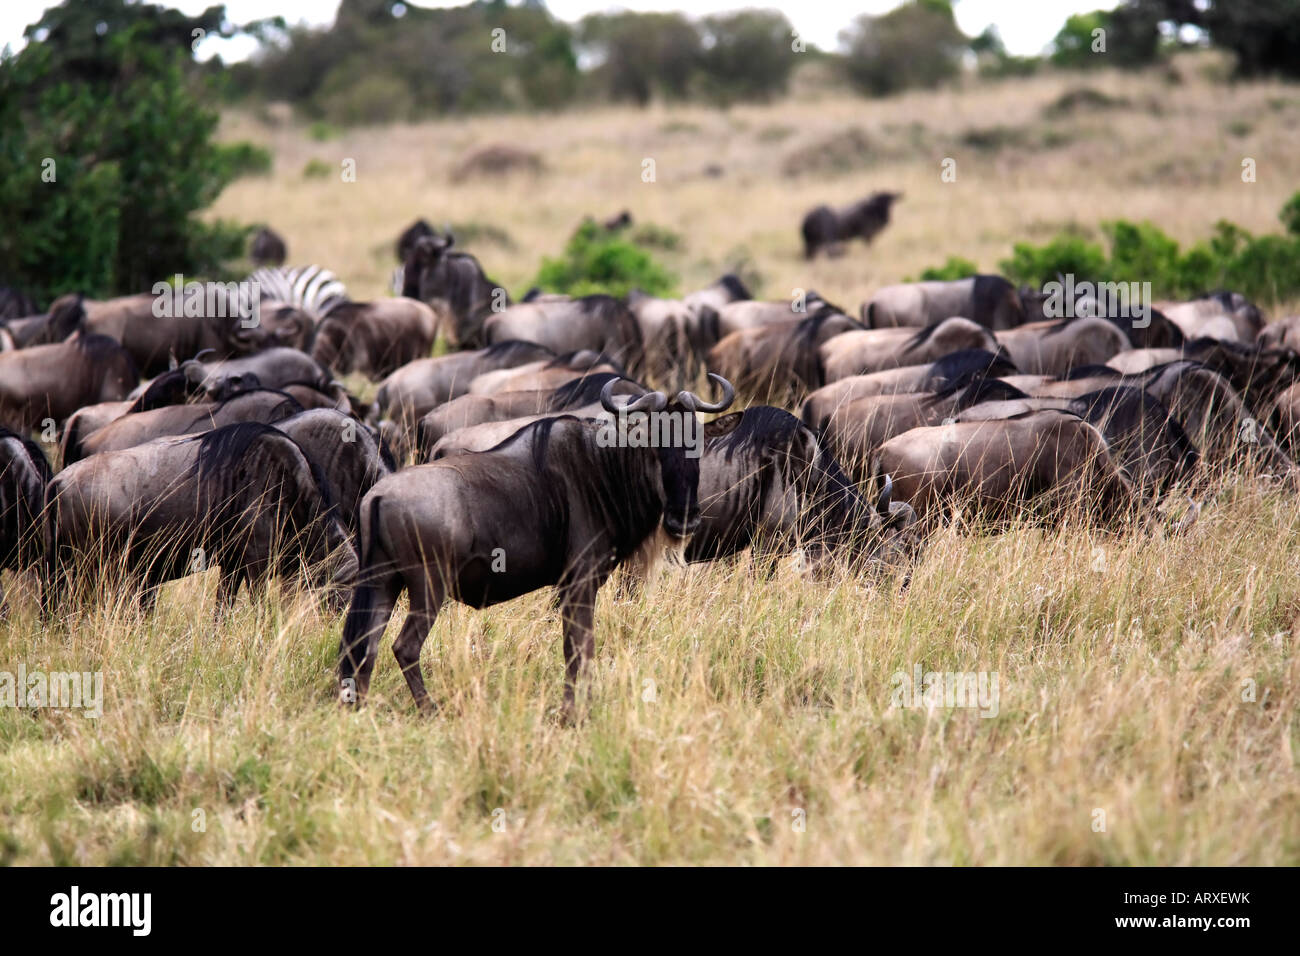 Wildebeest grazing  in the beautiful reserve of masai mara in kenya africa - Stock Image